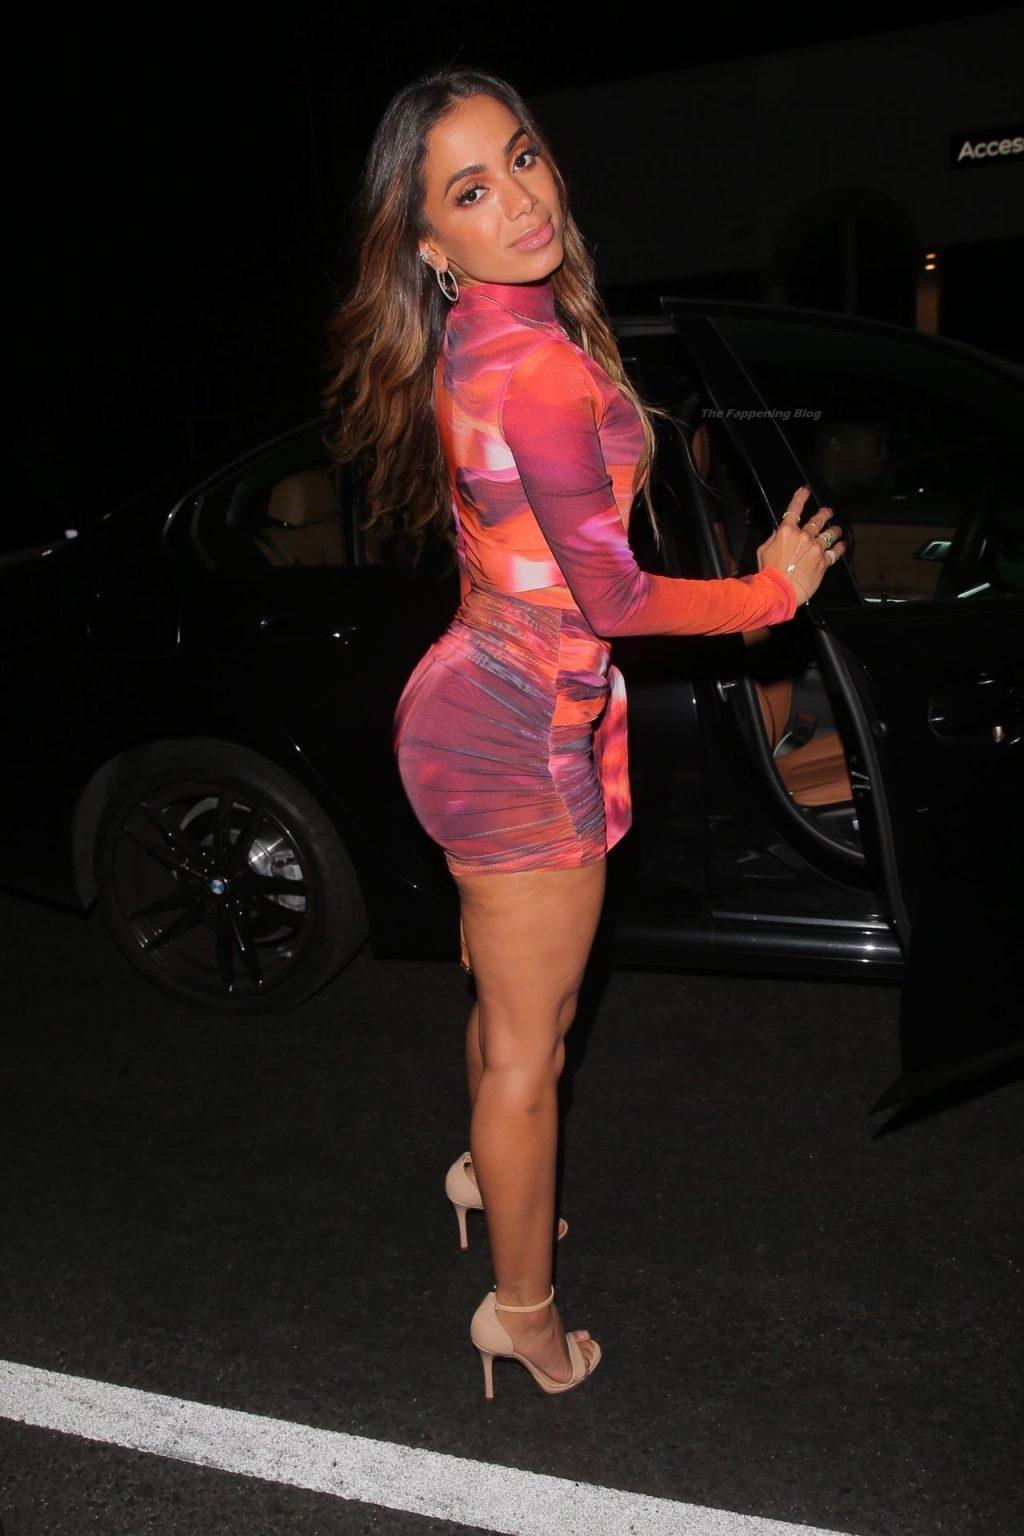 Anitta & Nikita Dragun are Seen Arriving at The Nice Guy (37 Photos + Video)